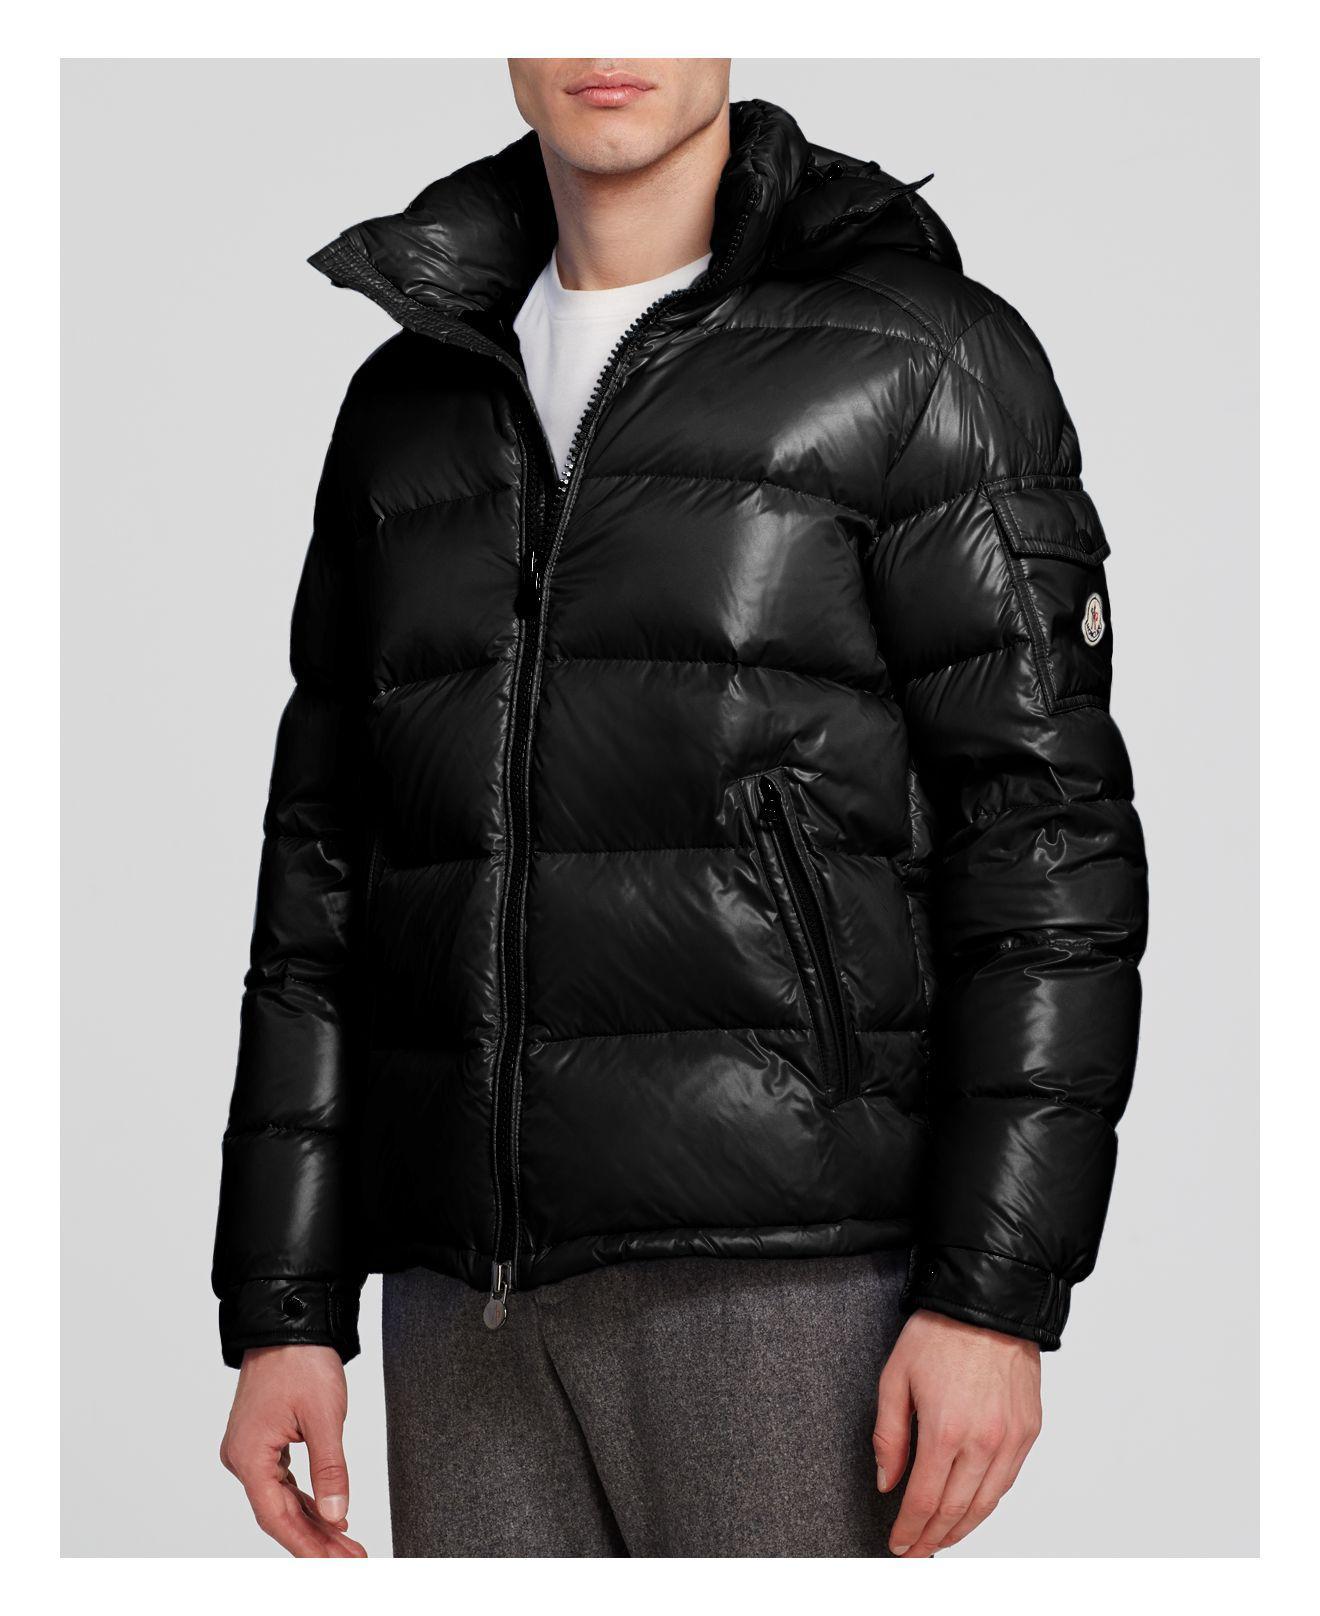 2a81a0b93 real moncler maya down puffer jacket vest 96647 6e731